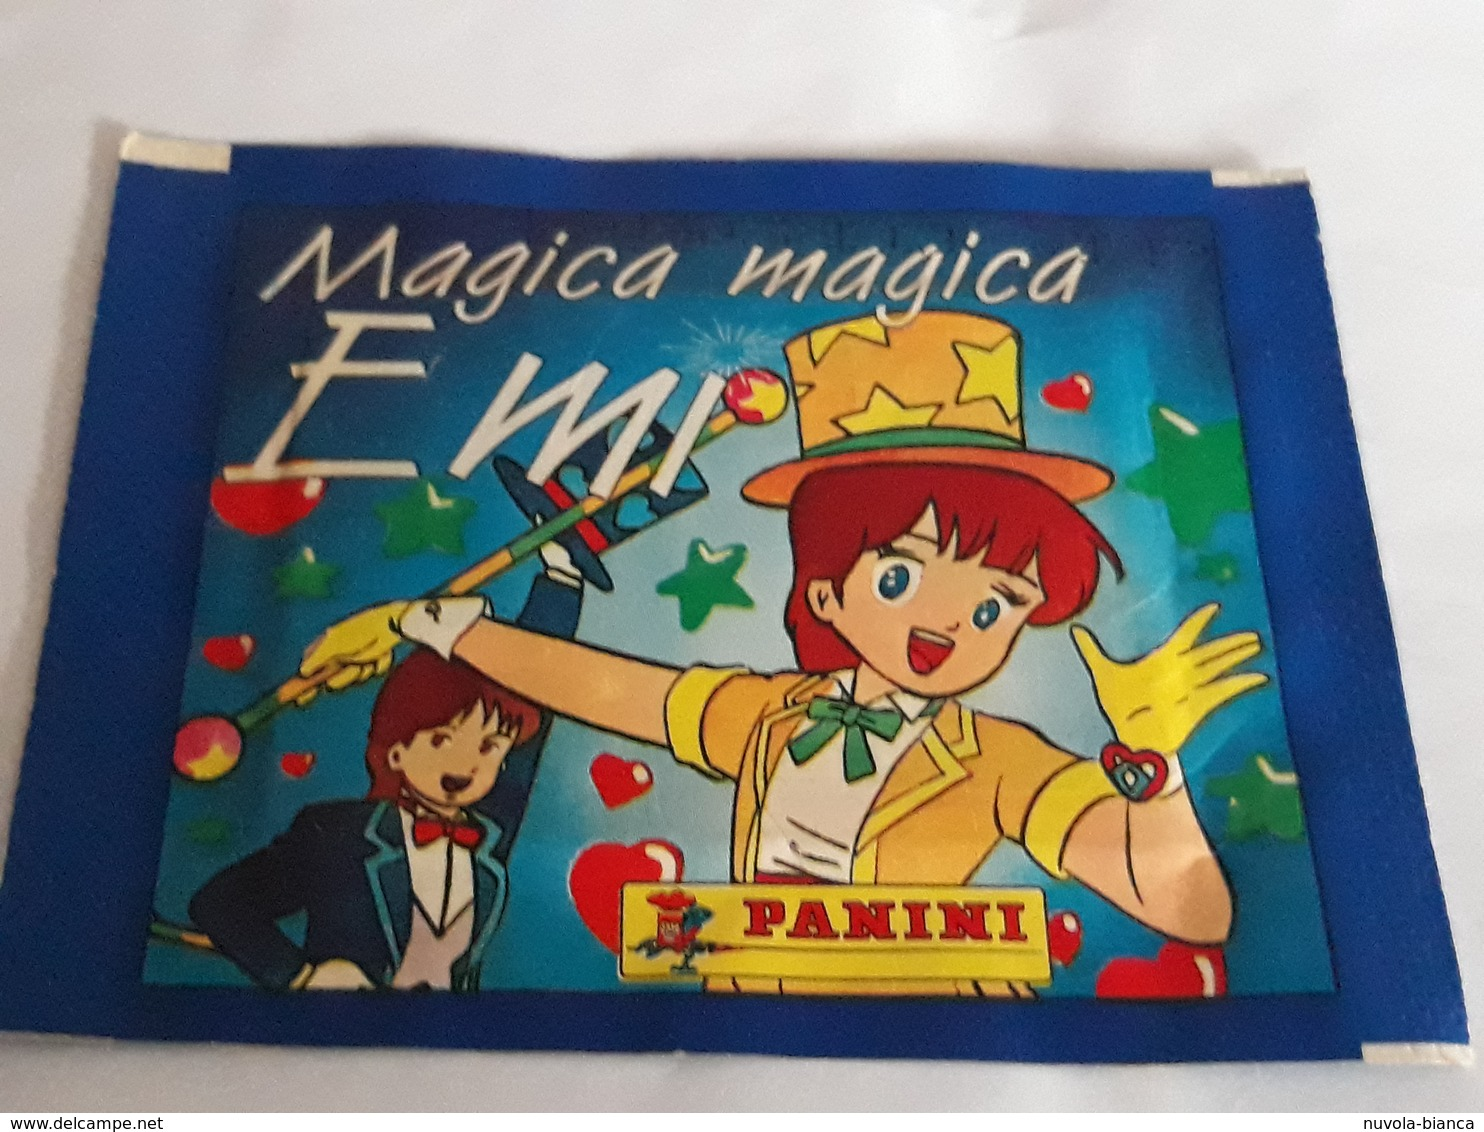 Magica Magica Emi Bustina Con Figurine Panini - Panini